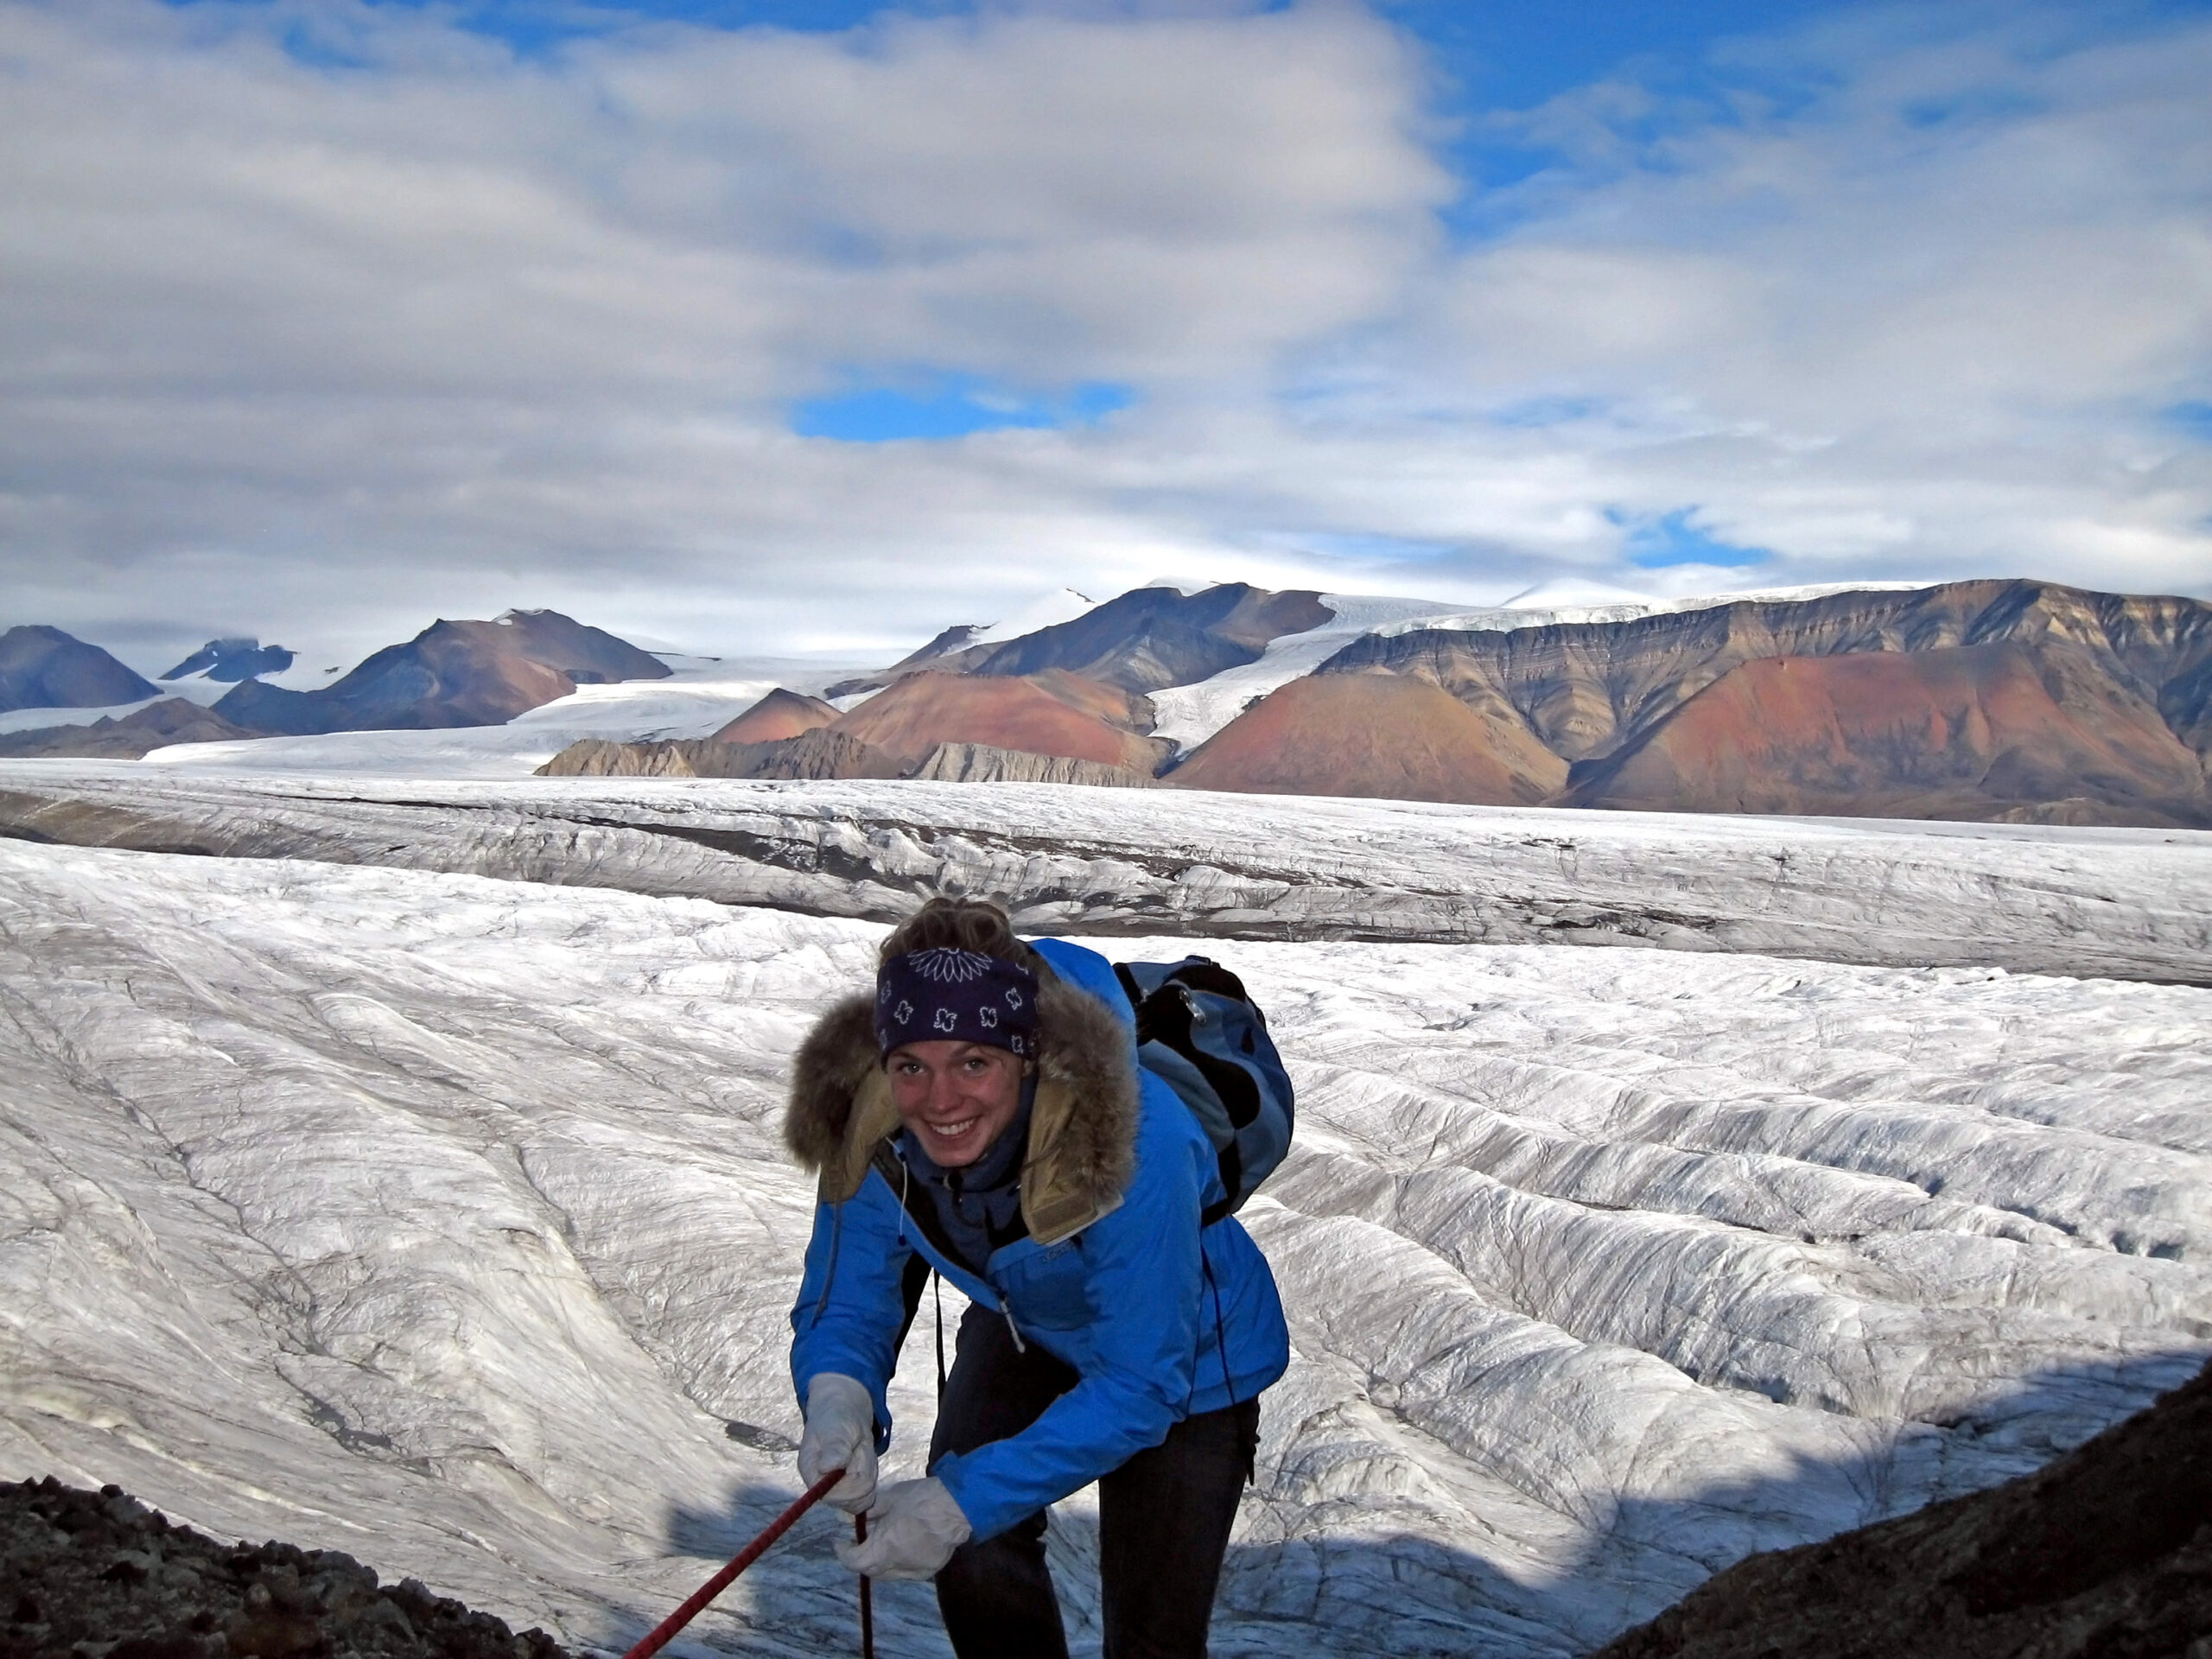 Zena Cardman smiles near a glacier.